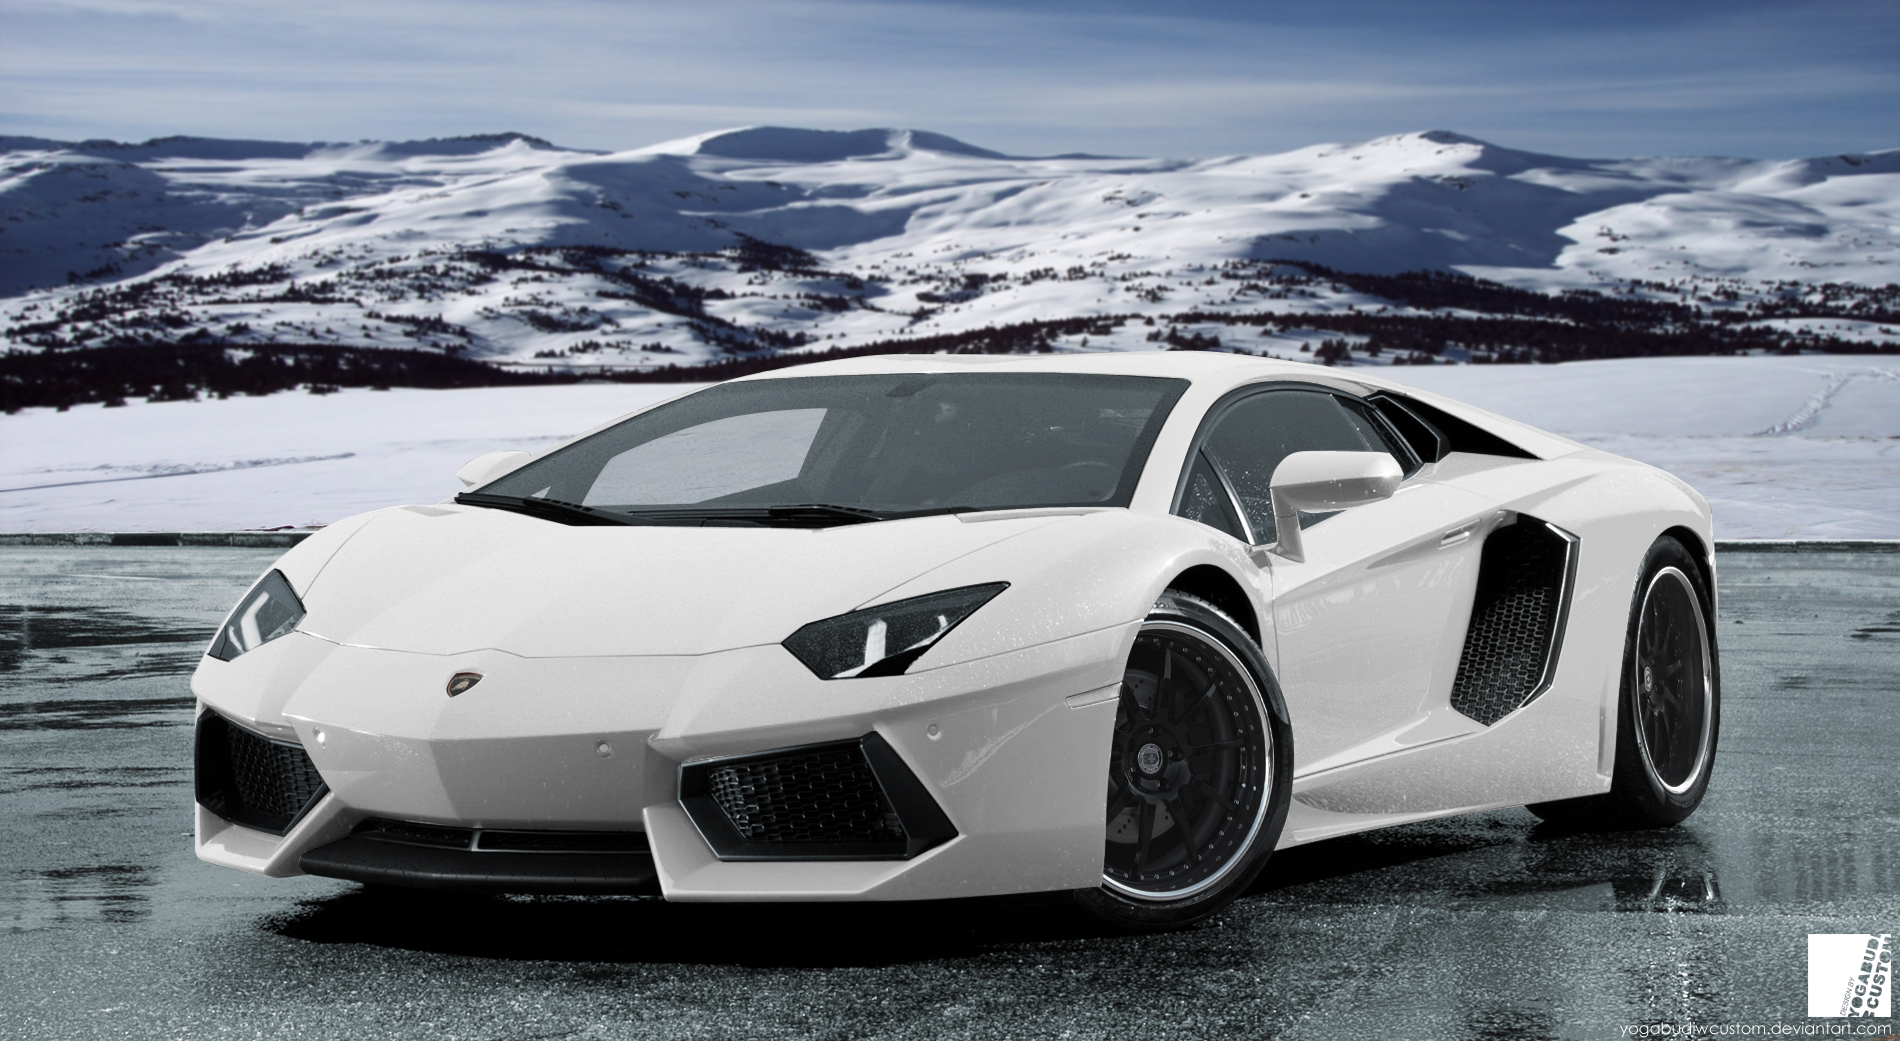 Lamborghini Aventador LP 700-4 White by YogaBudiwCUSTOM